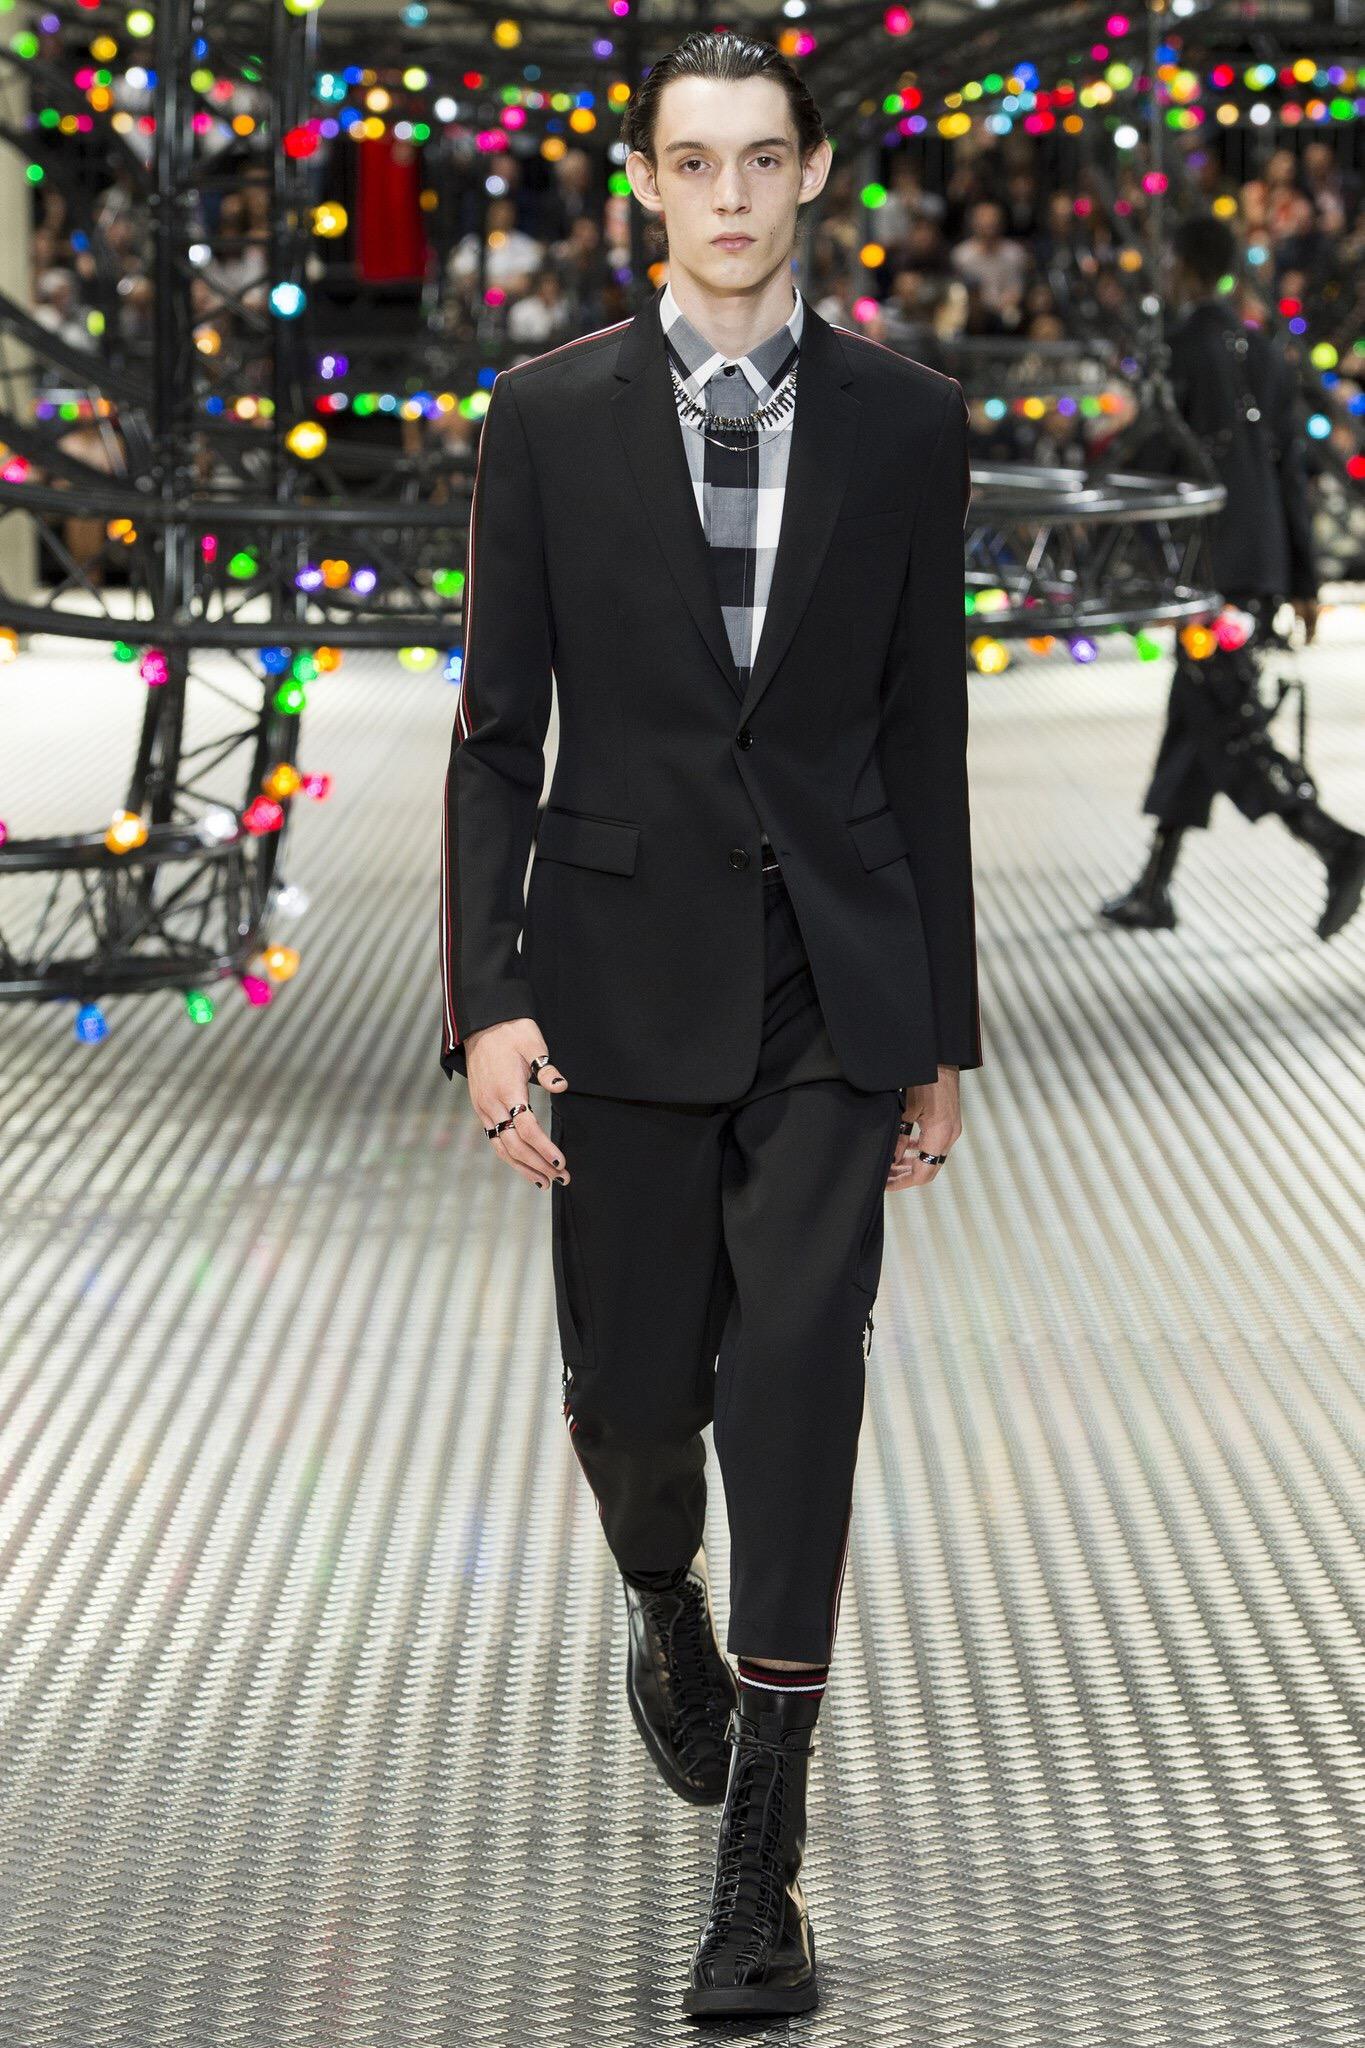 Dior Homme SPRING 2016 Menswear